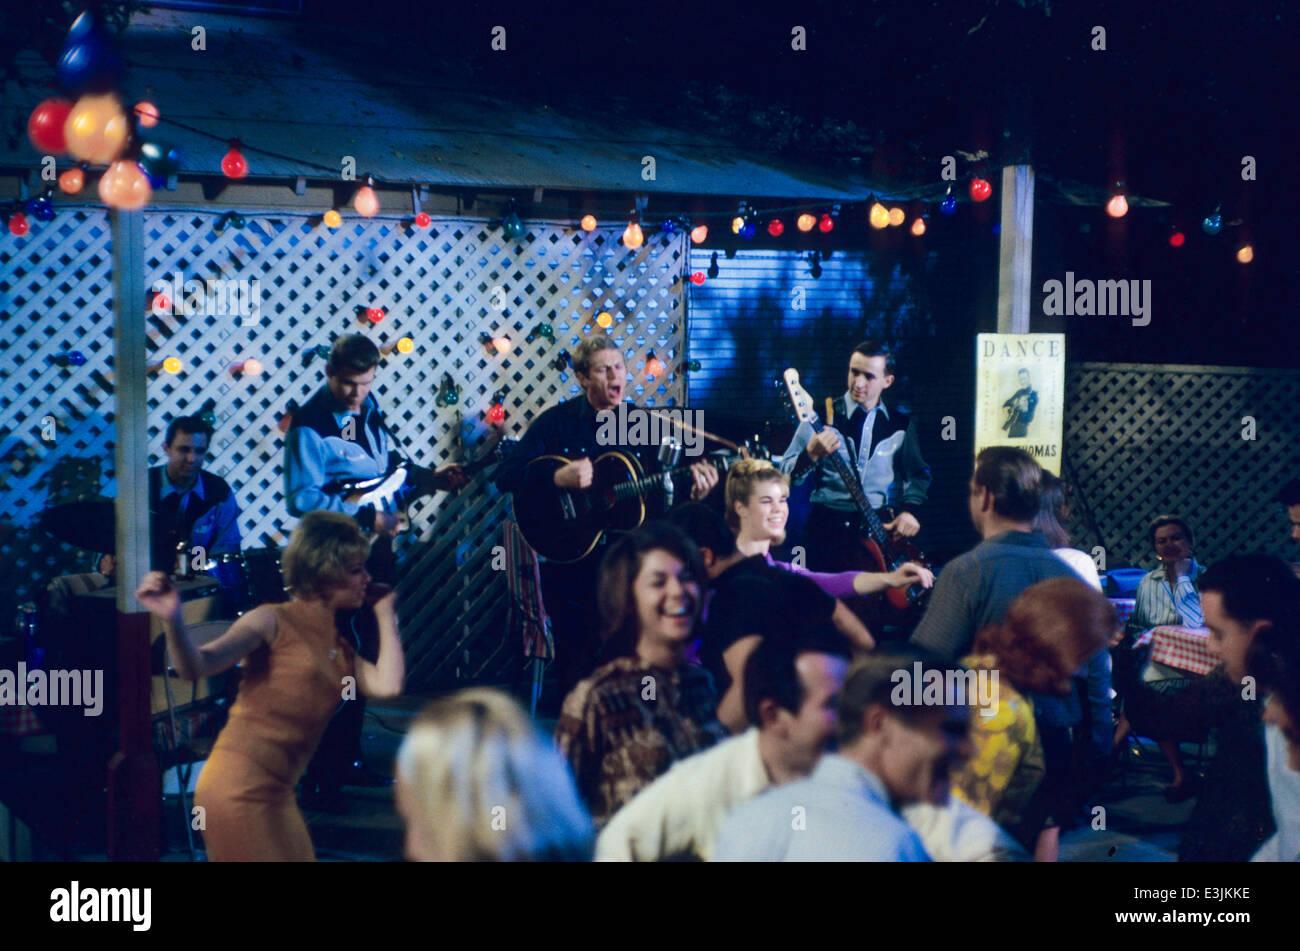 Steve McQueen - Stock Image